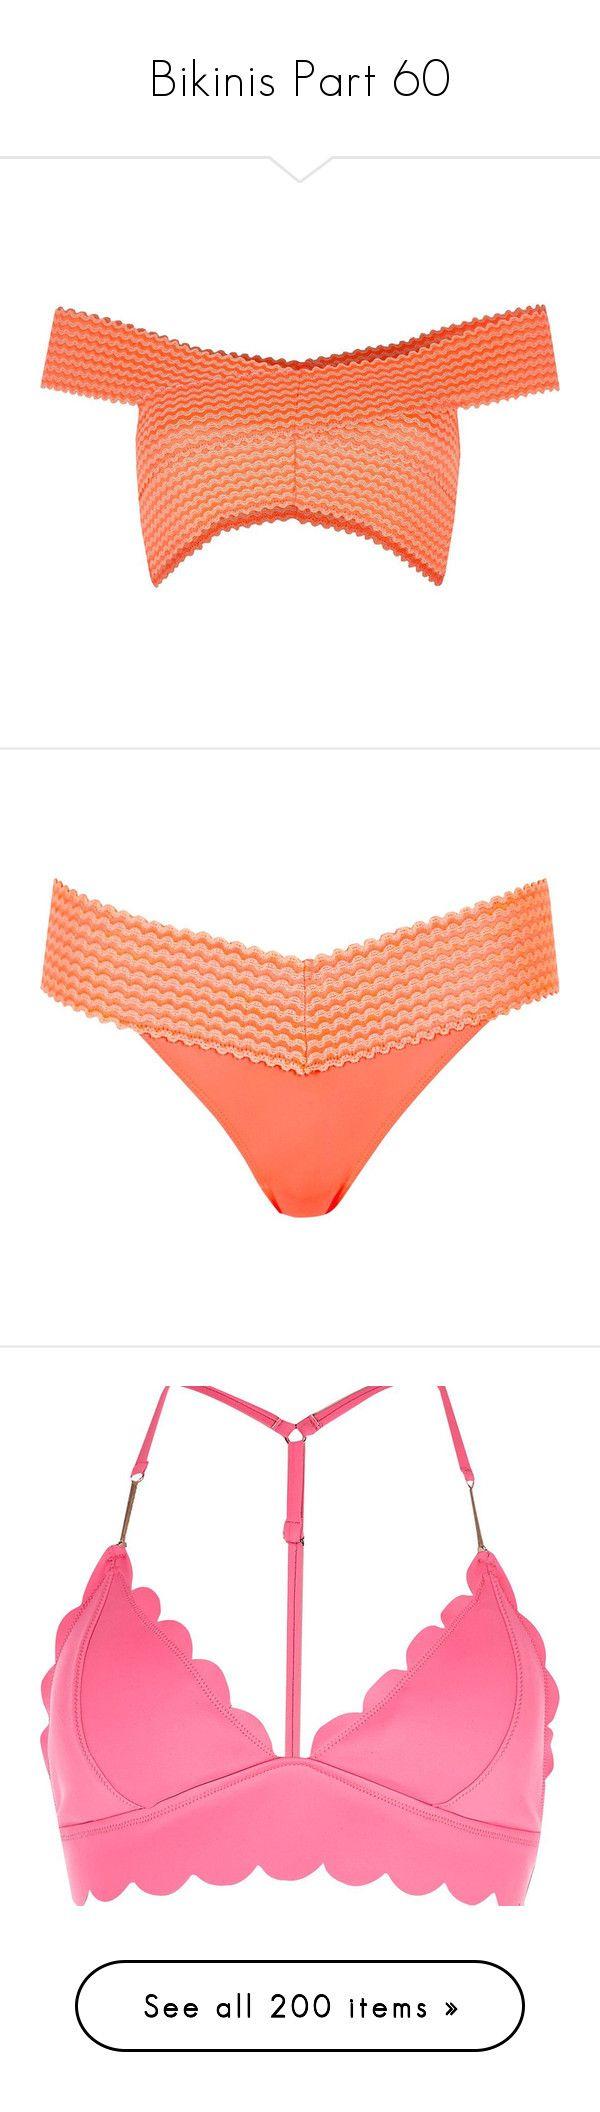 """Bikinis Part 60"" by leanne-mcclean ❤ liked on Polyvore featuring swimwear, bikinis, bikini tops, tall tankini tops, bandage bikini top, river island, swim suit tops, tankini tops, low rise bikini and tall swimwear"